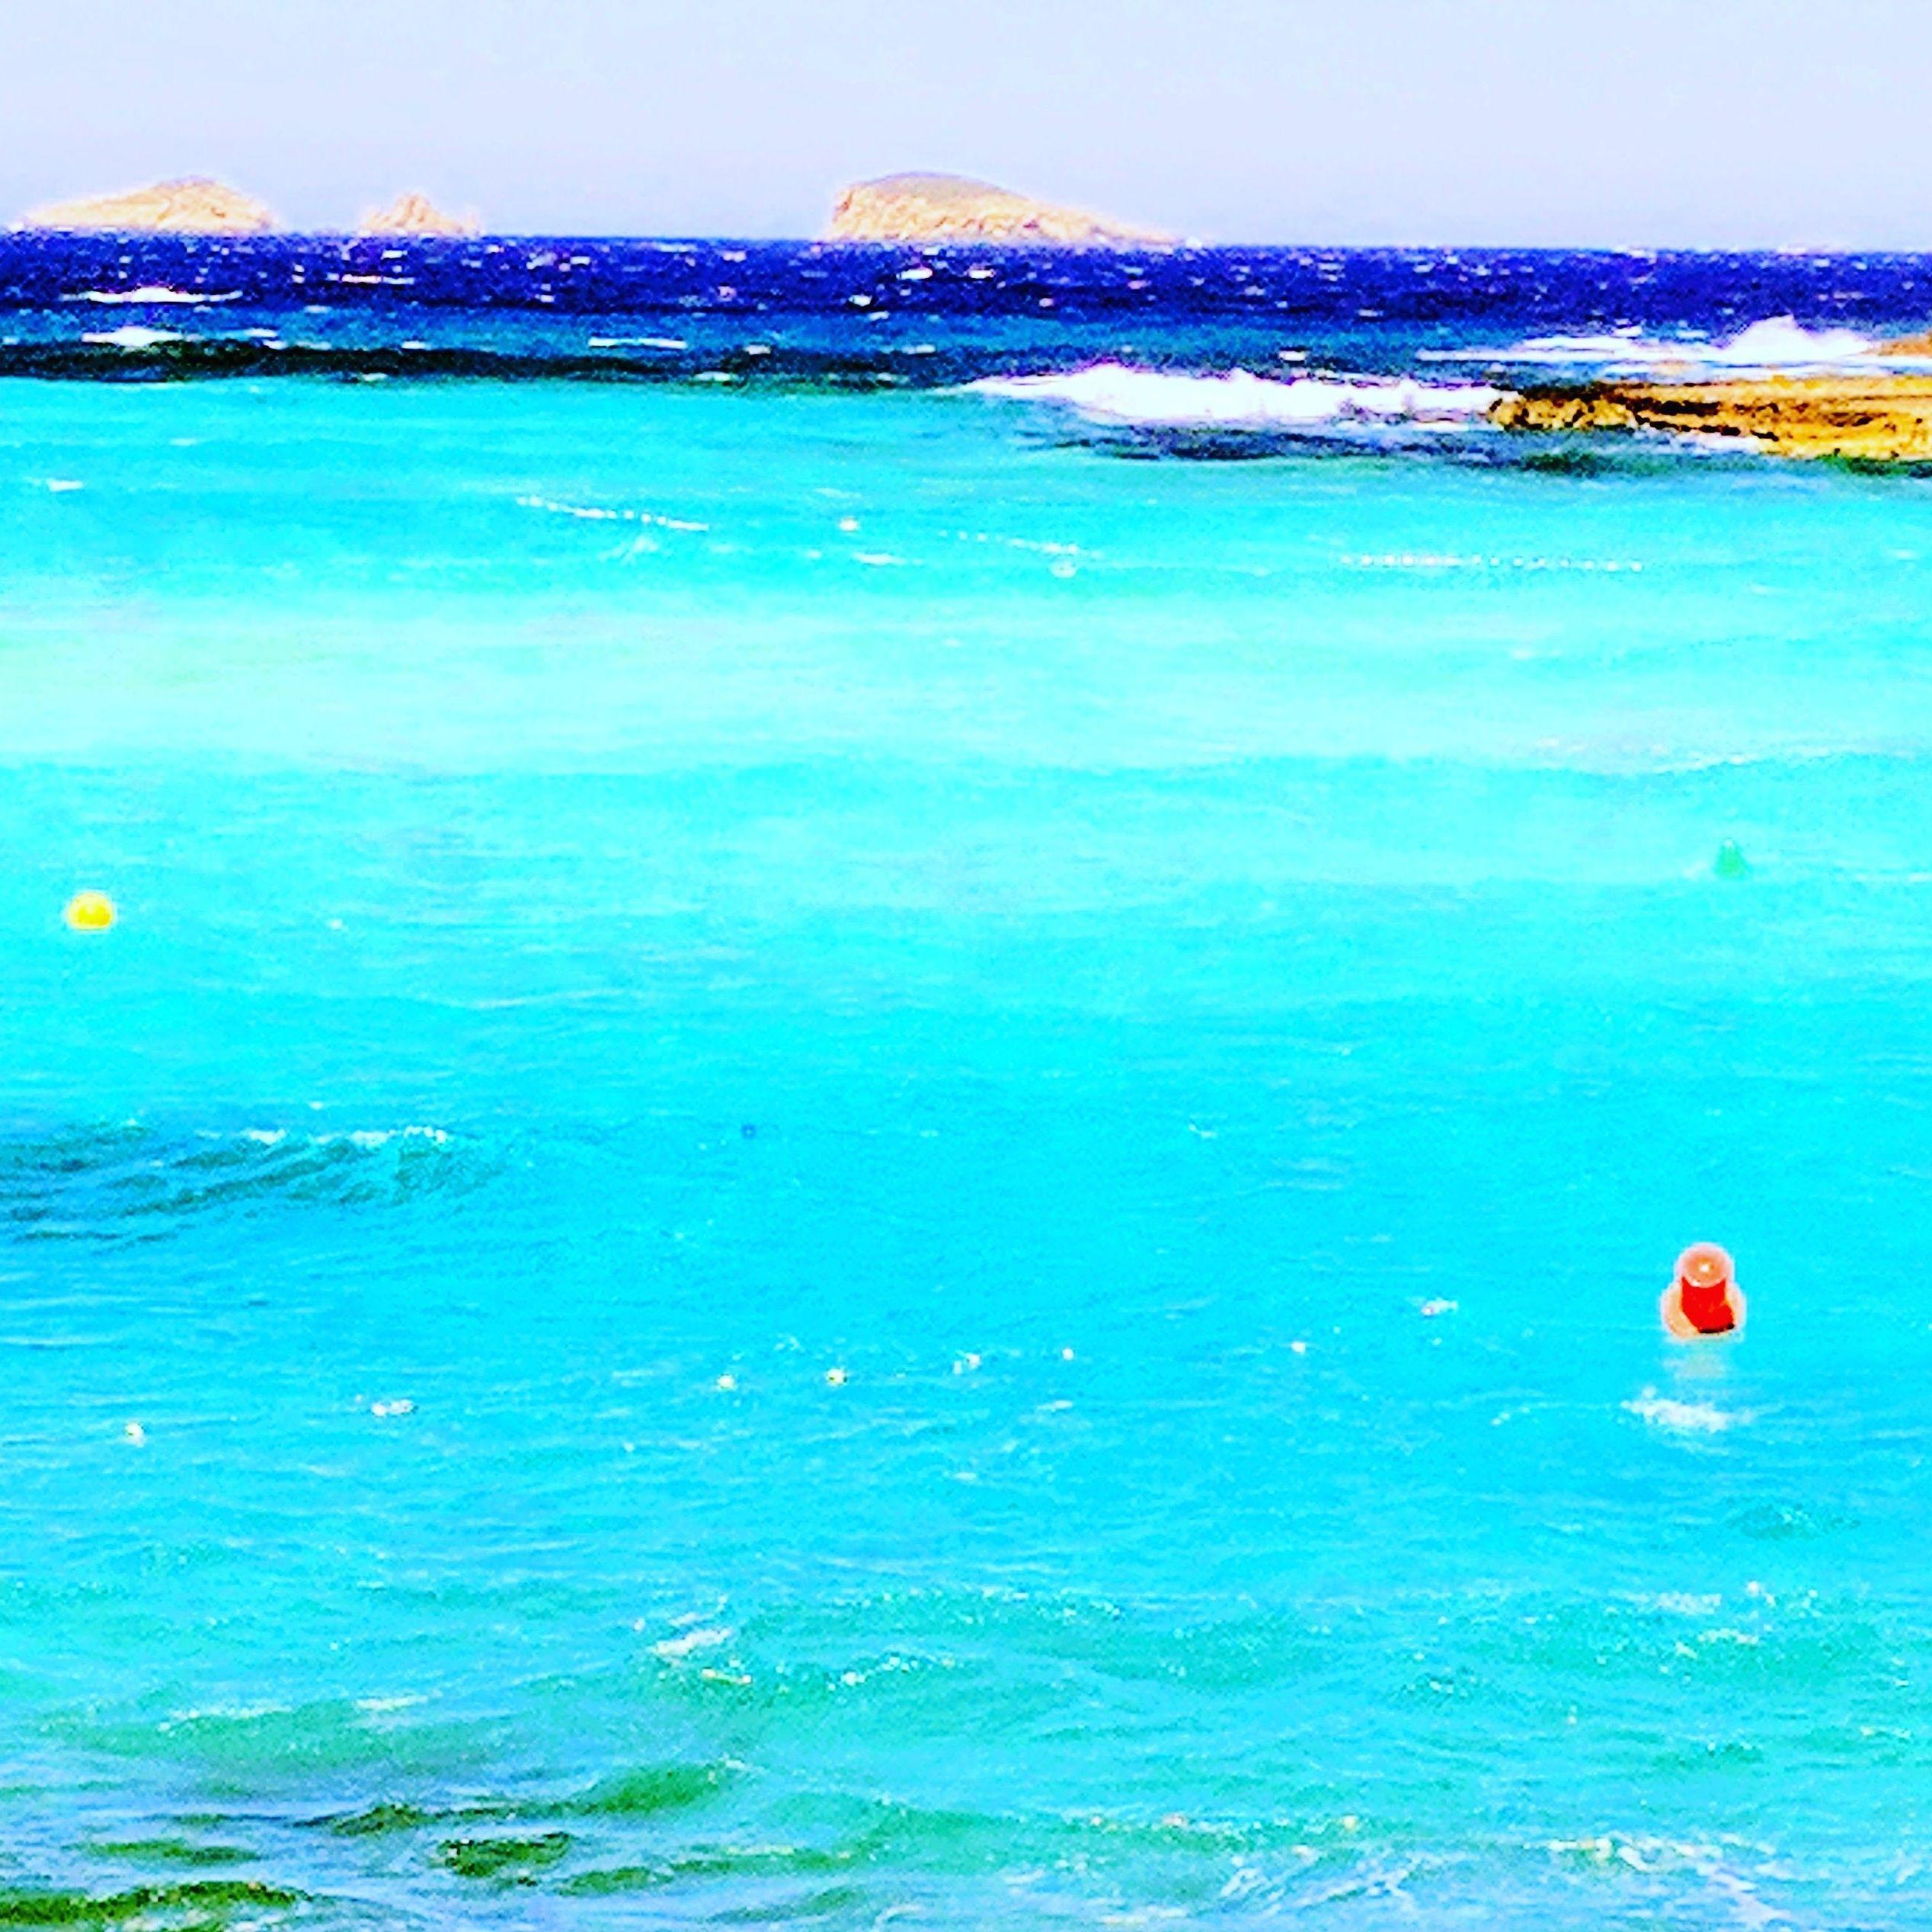 Foto 1 de Abogados en Eivissa | Raad Abogados. Tel 691 270 993